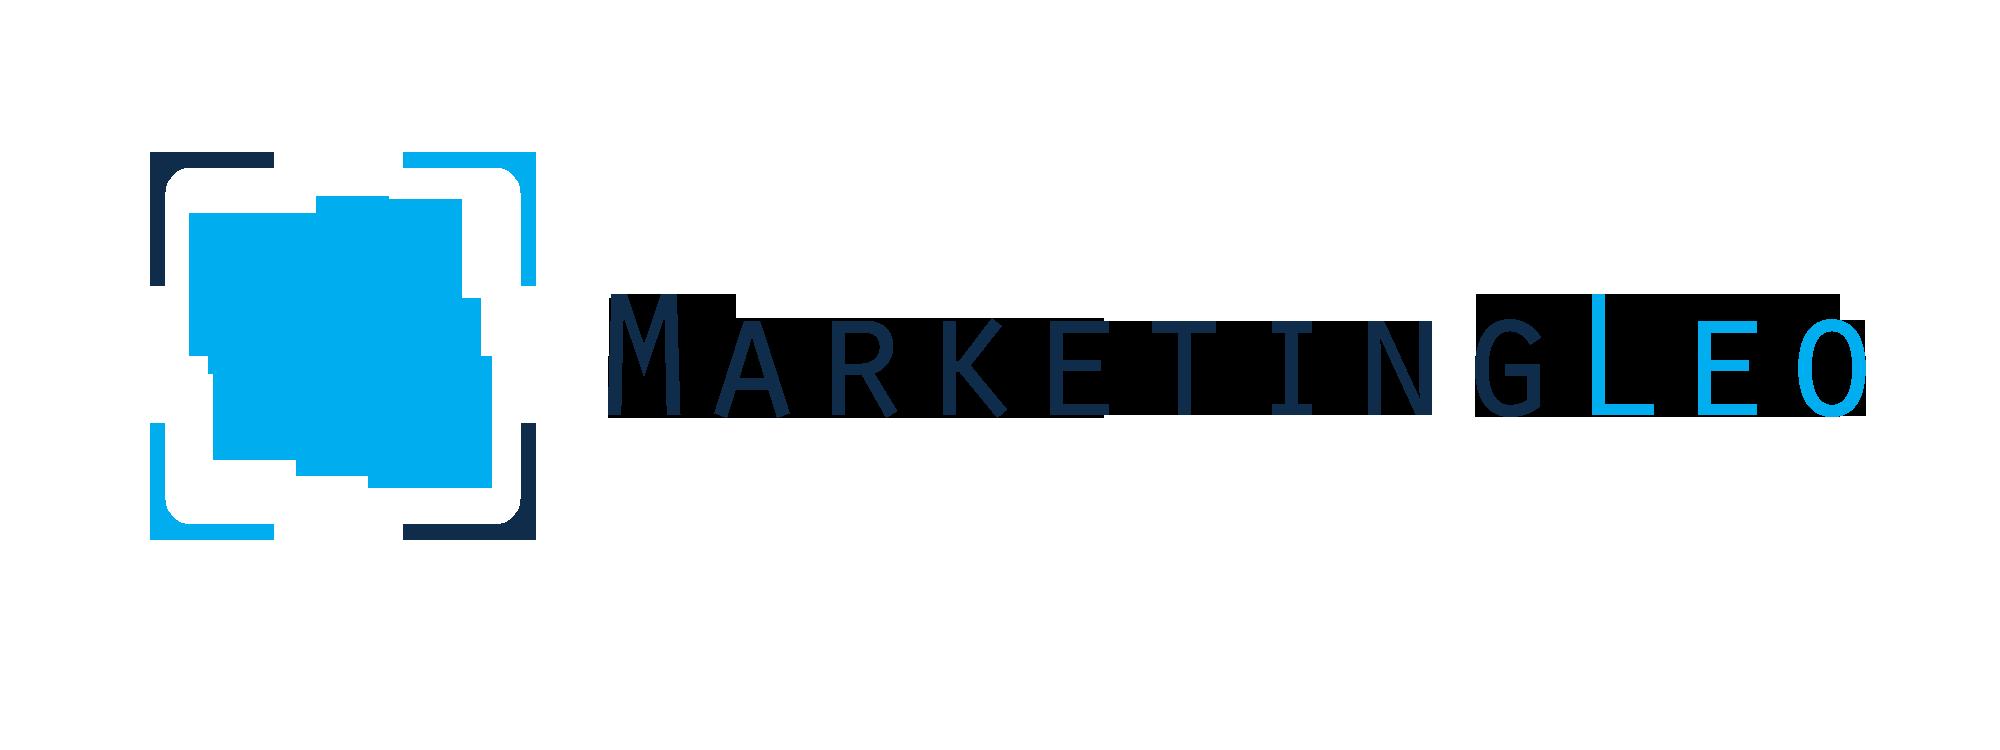 MarketingLeo reviews